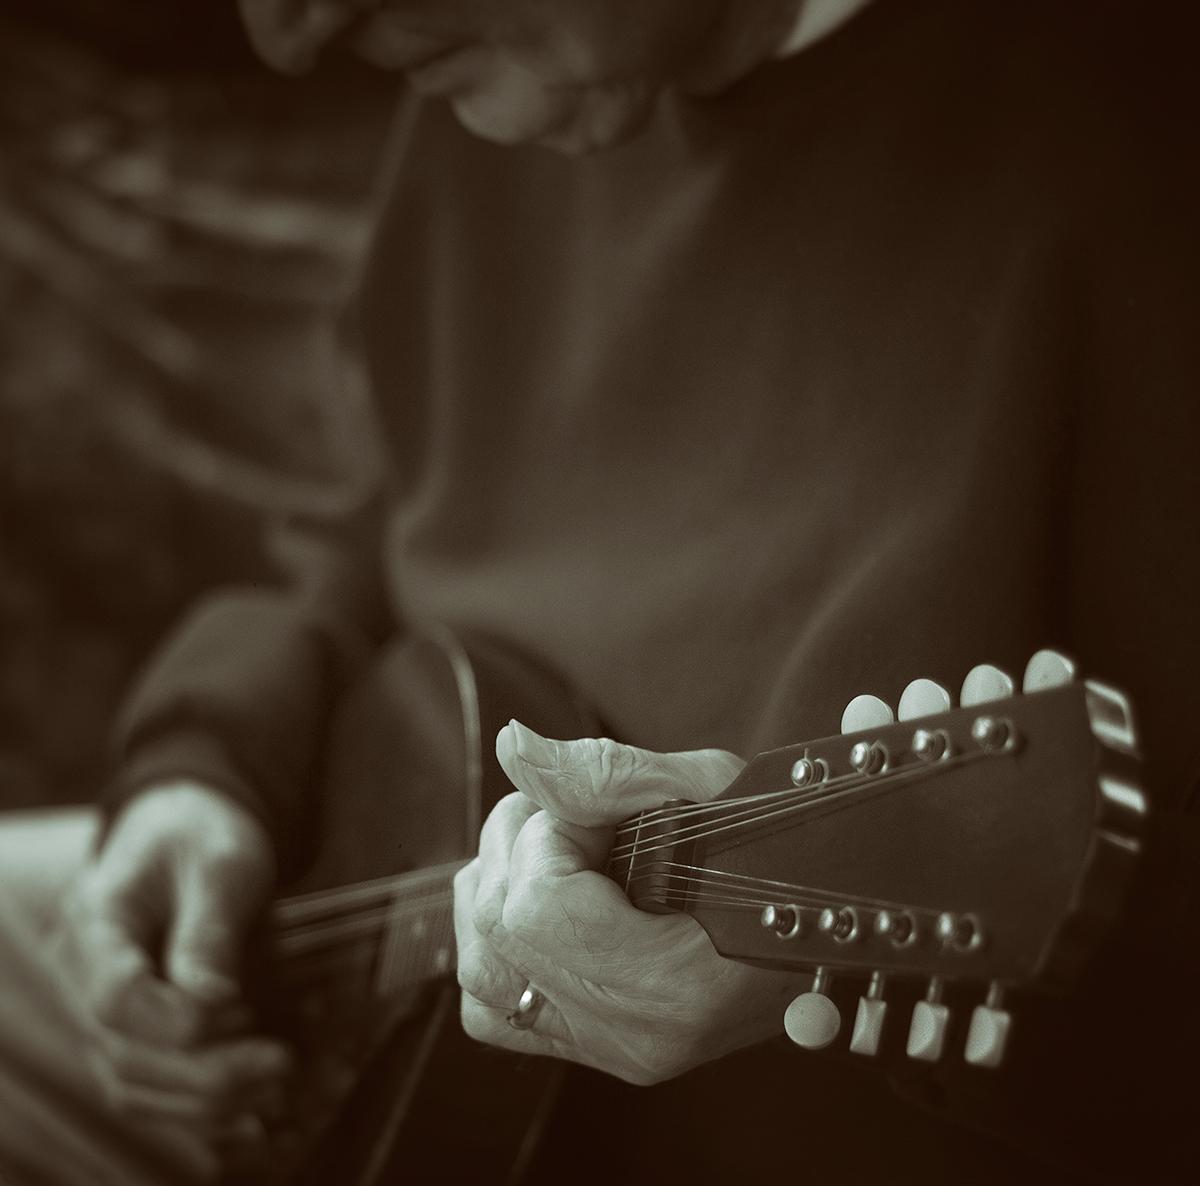 Play me a plain song.